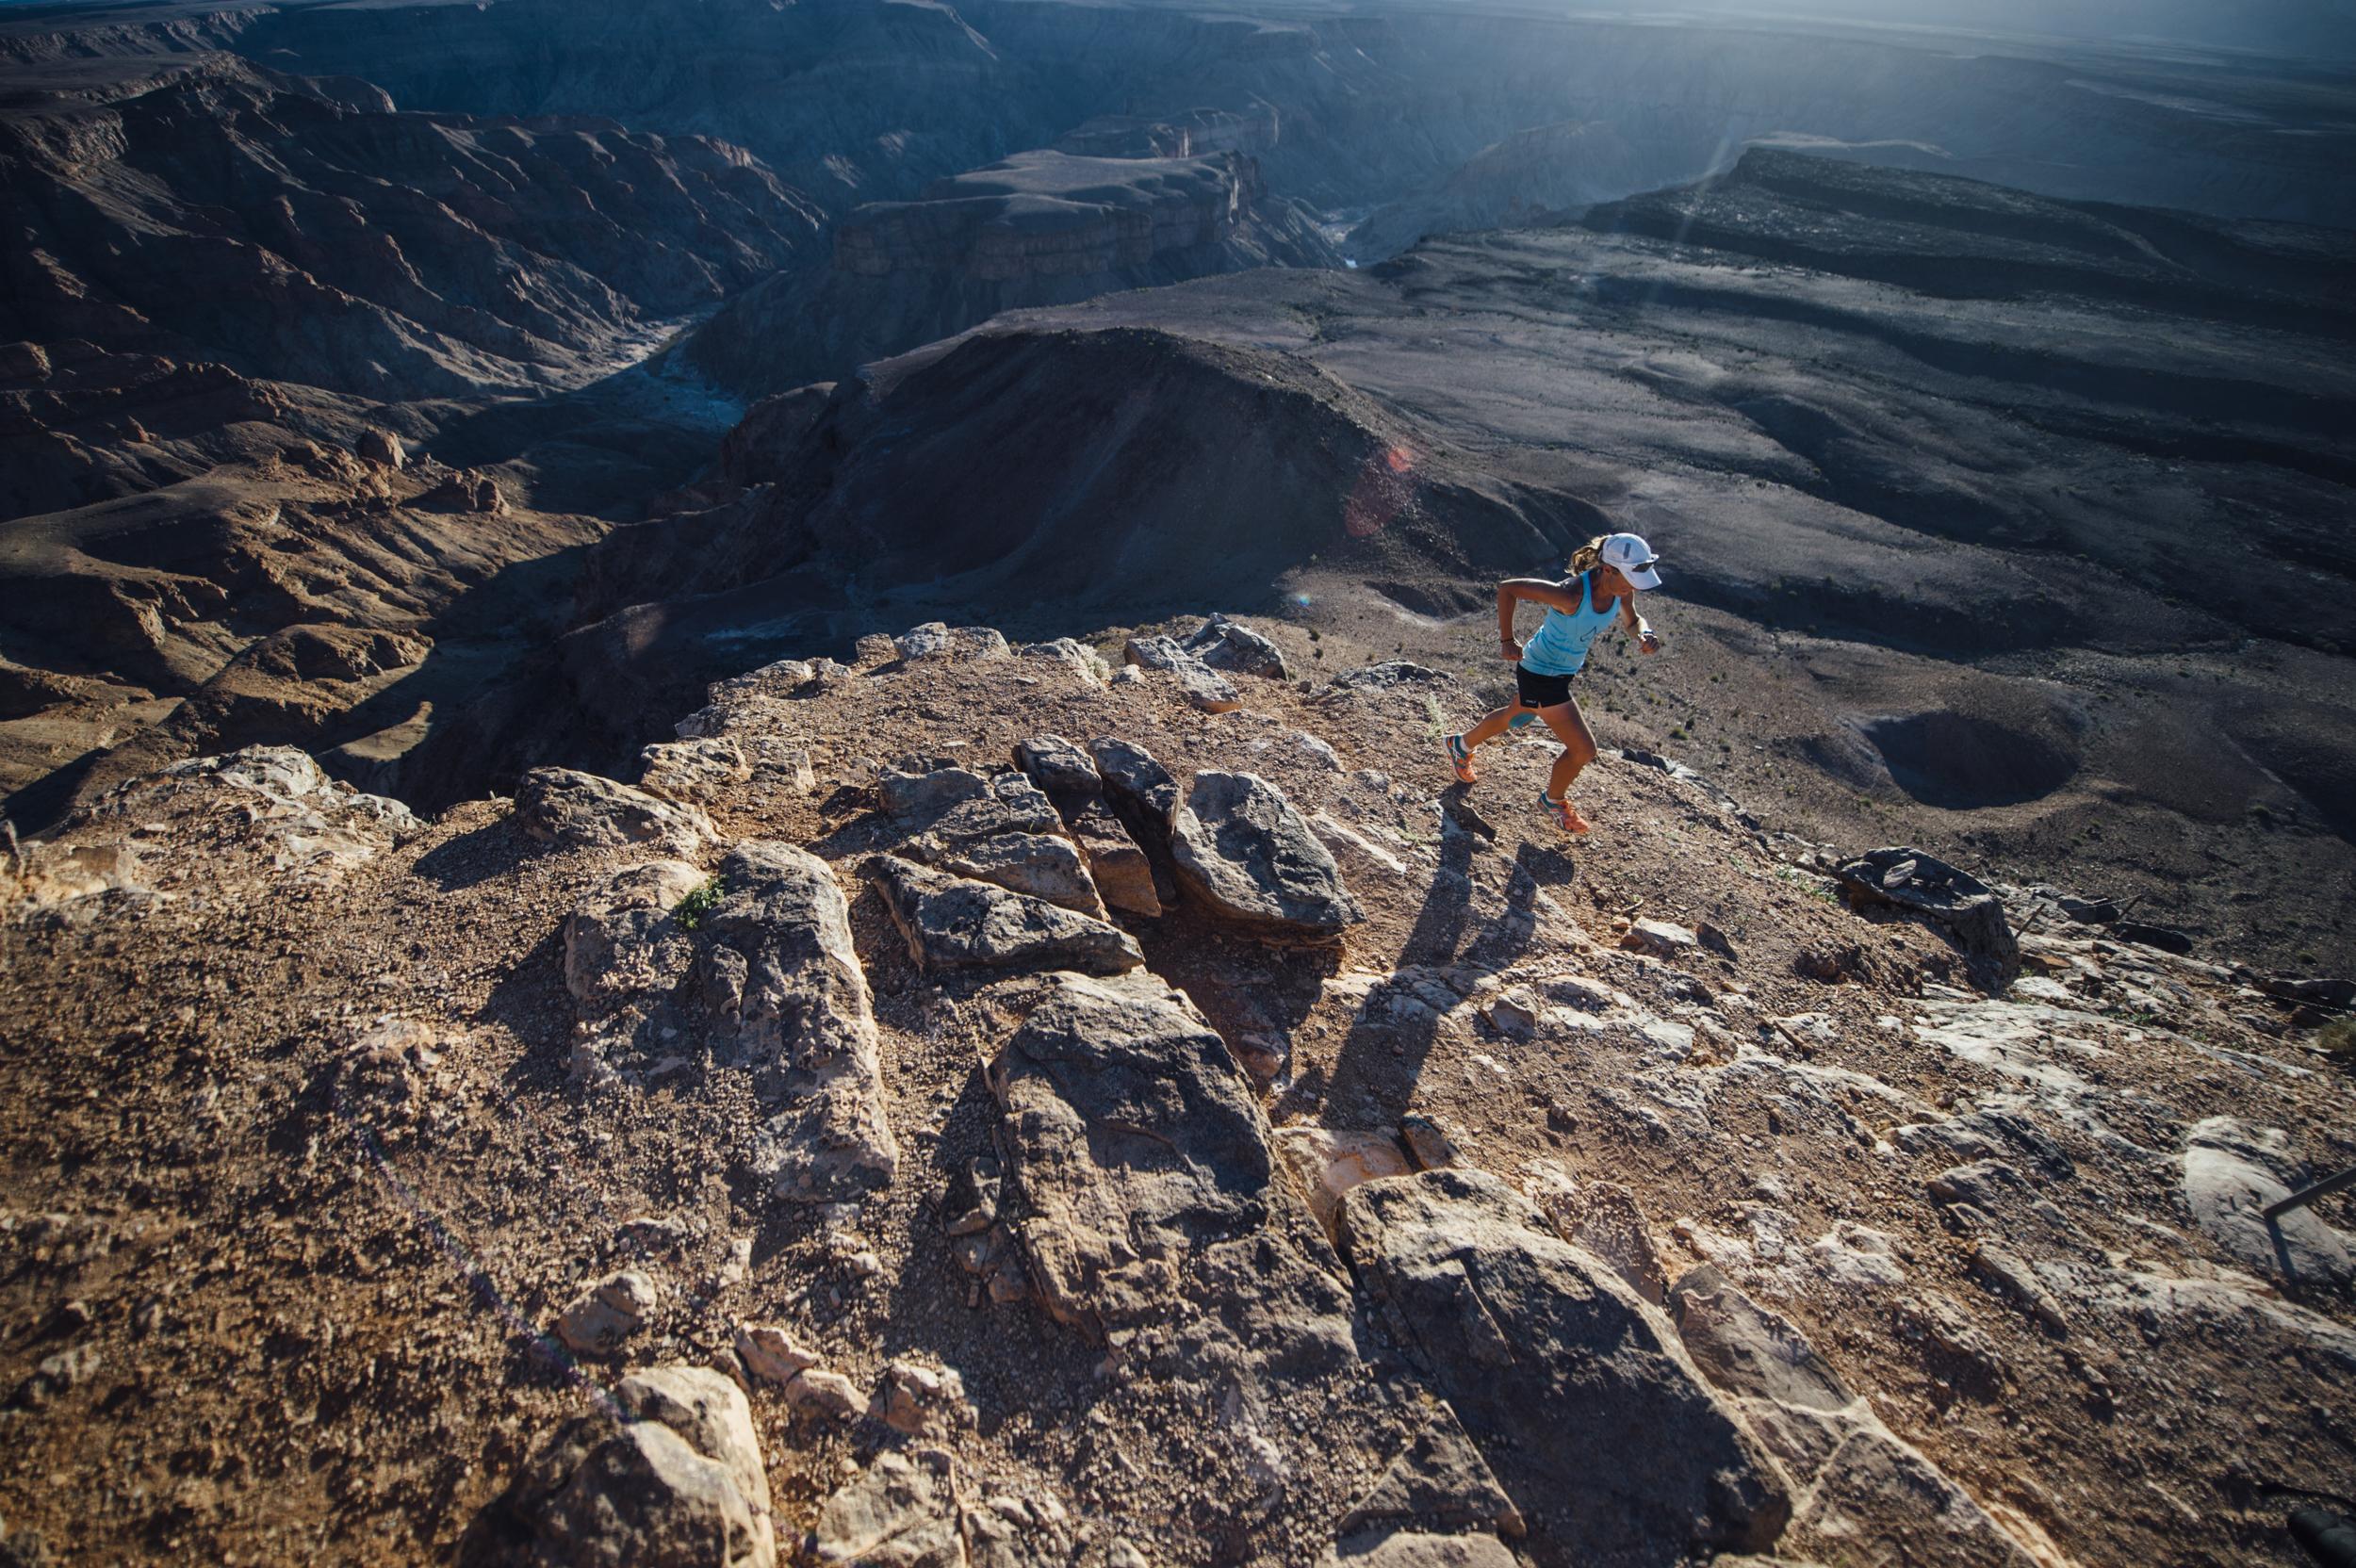 Mina Guli Running in the Richtersveld National Park in South Africa